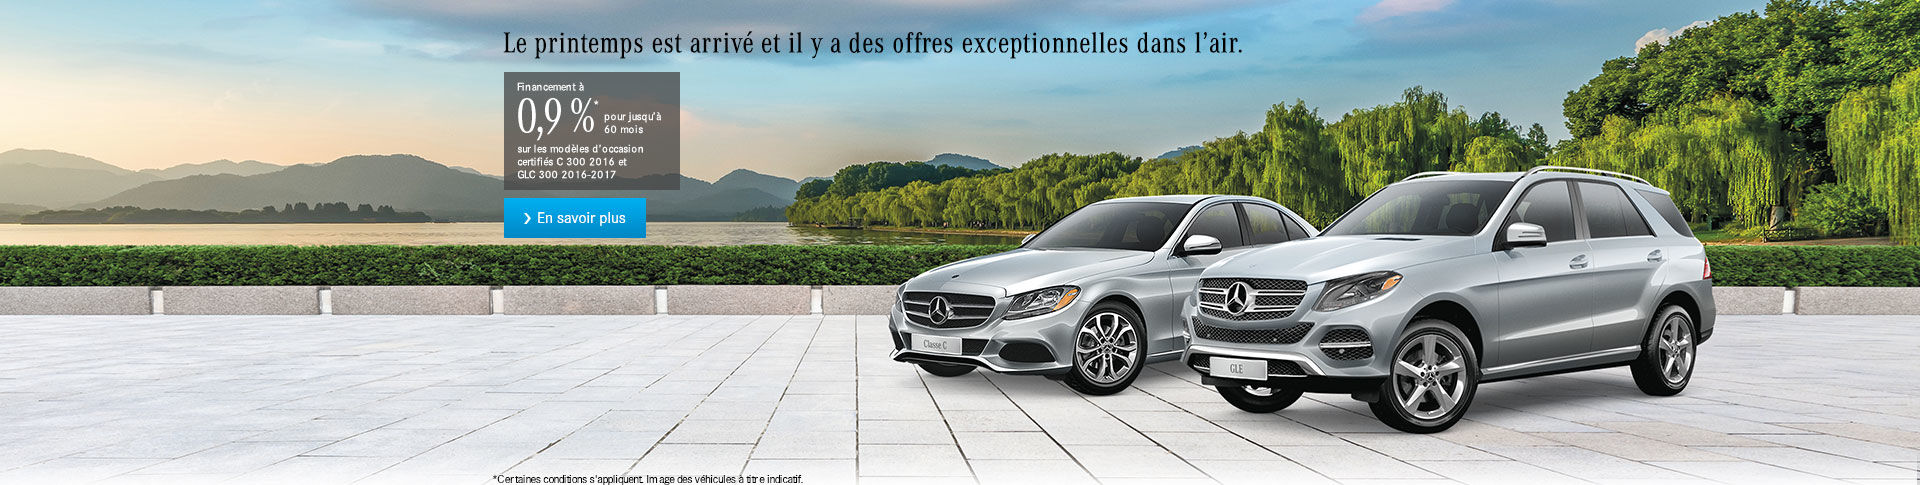 CPO Mercedes